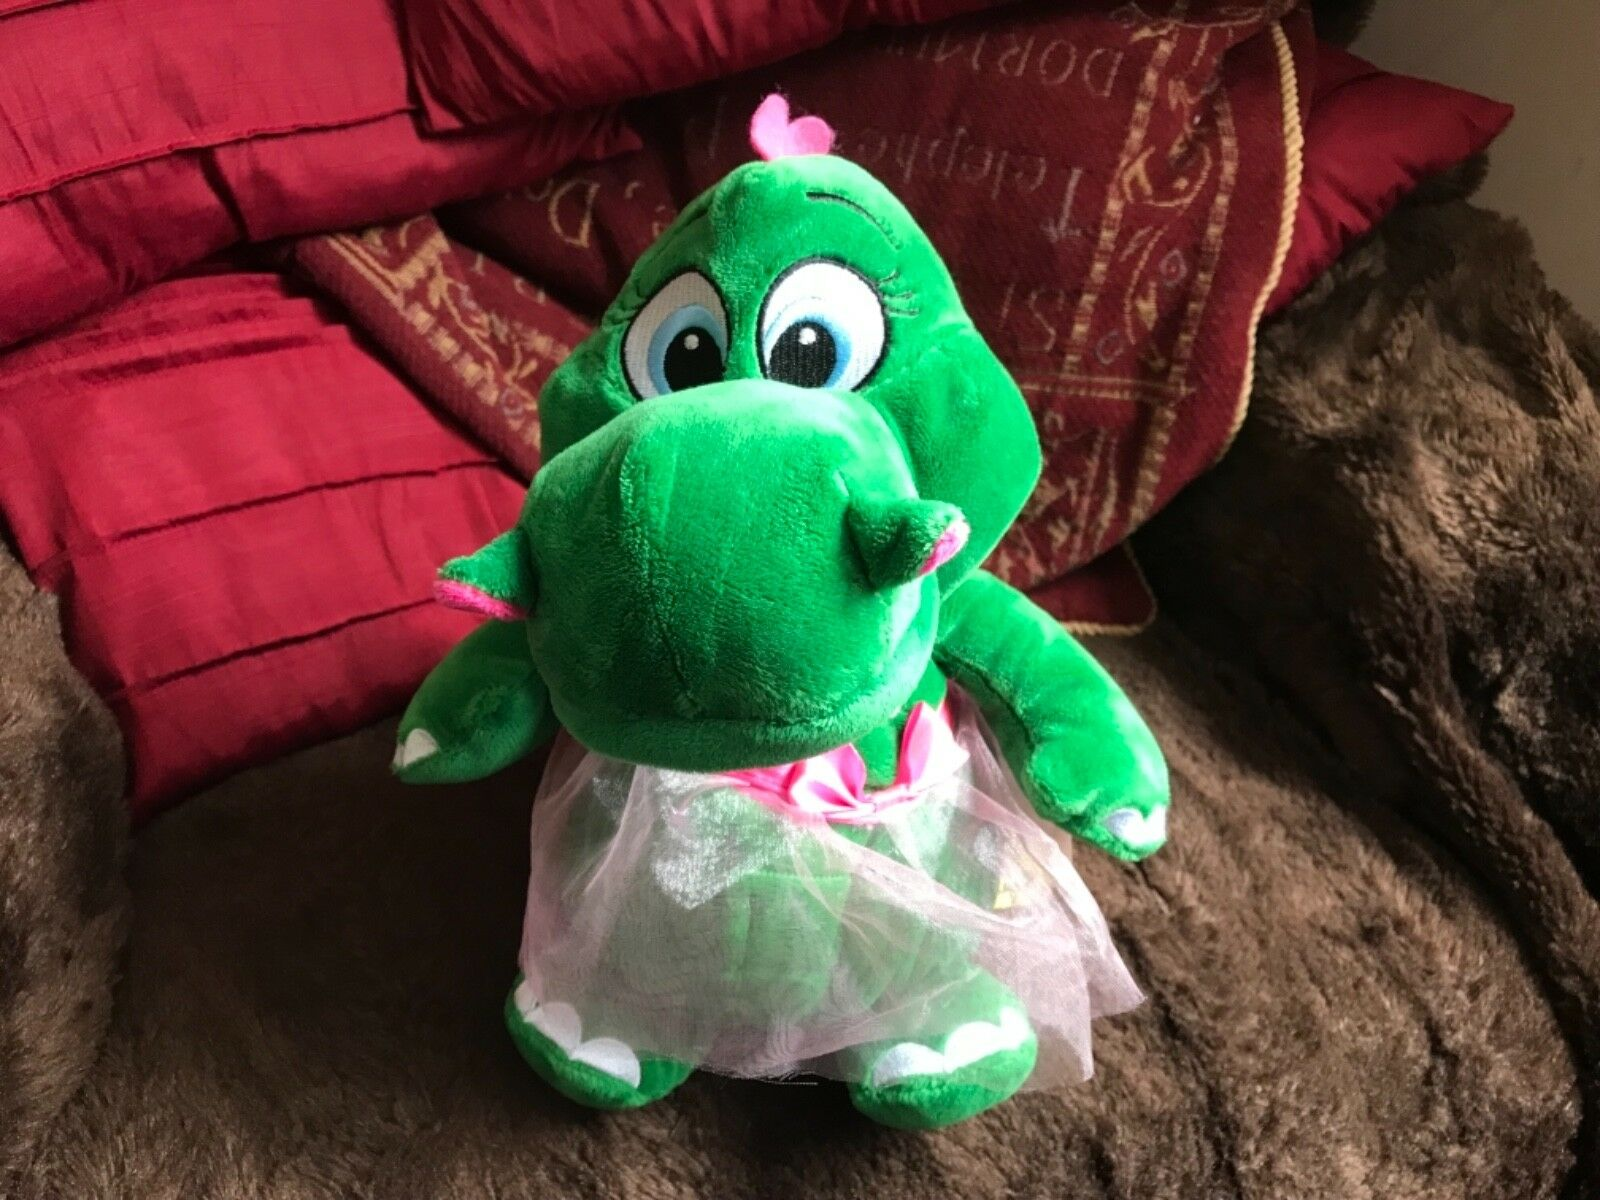 "LEGOLAND GREEN DRAGON SOFT TOY PLUSH WEARING PINK BALLET SKIRT 12"" NEW NO TAGS"